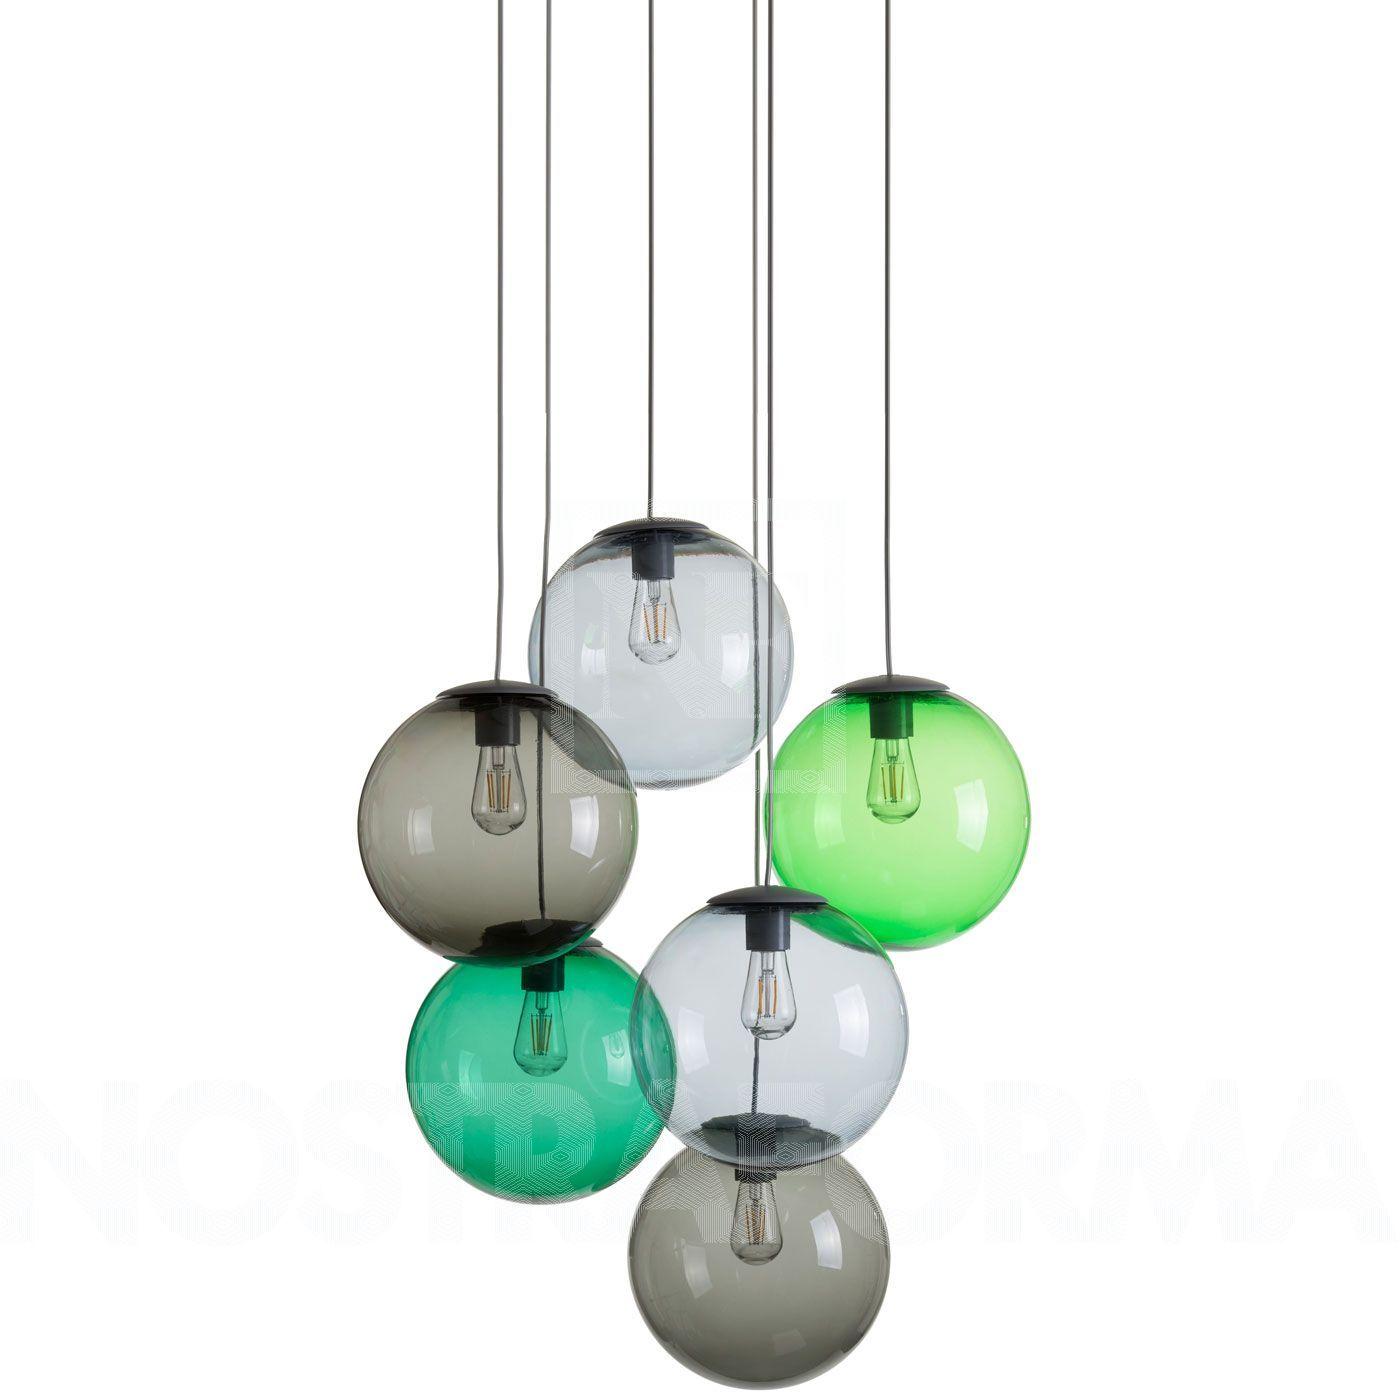 Fatboy Spheremaker Pendant Lamp Six Globes Modern And Contemporary Lighting Fixtures Chandeliers Furniture Lamp Contemporary Light Fixtures Pendant Lamp